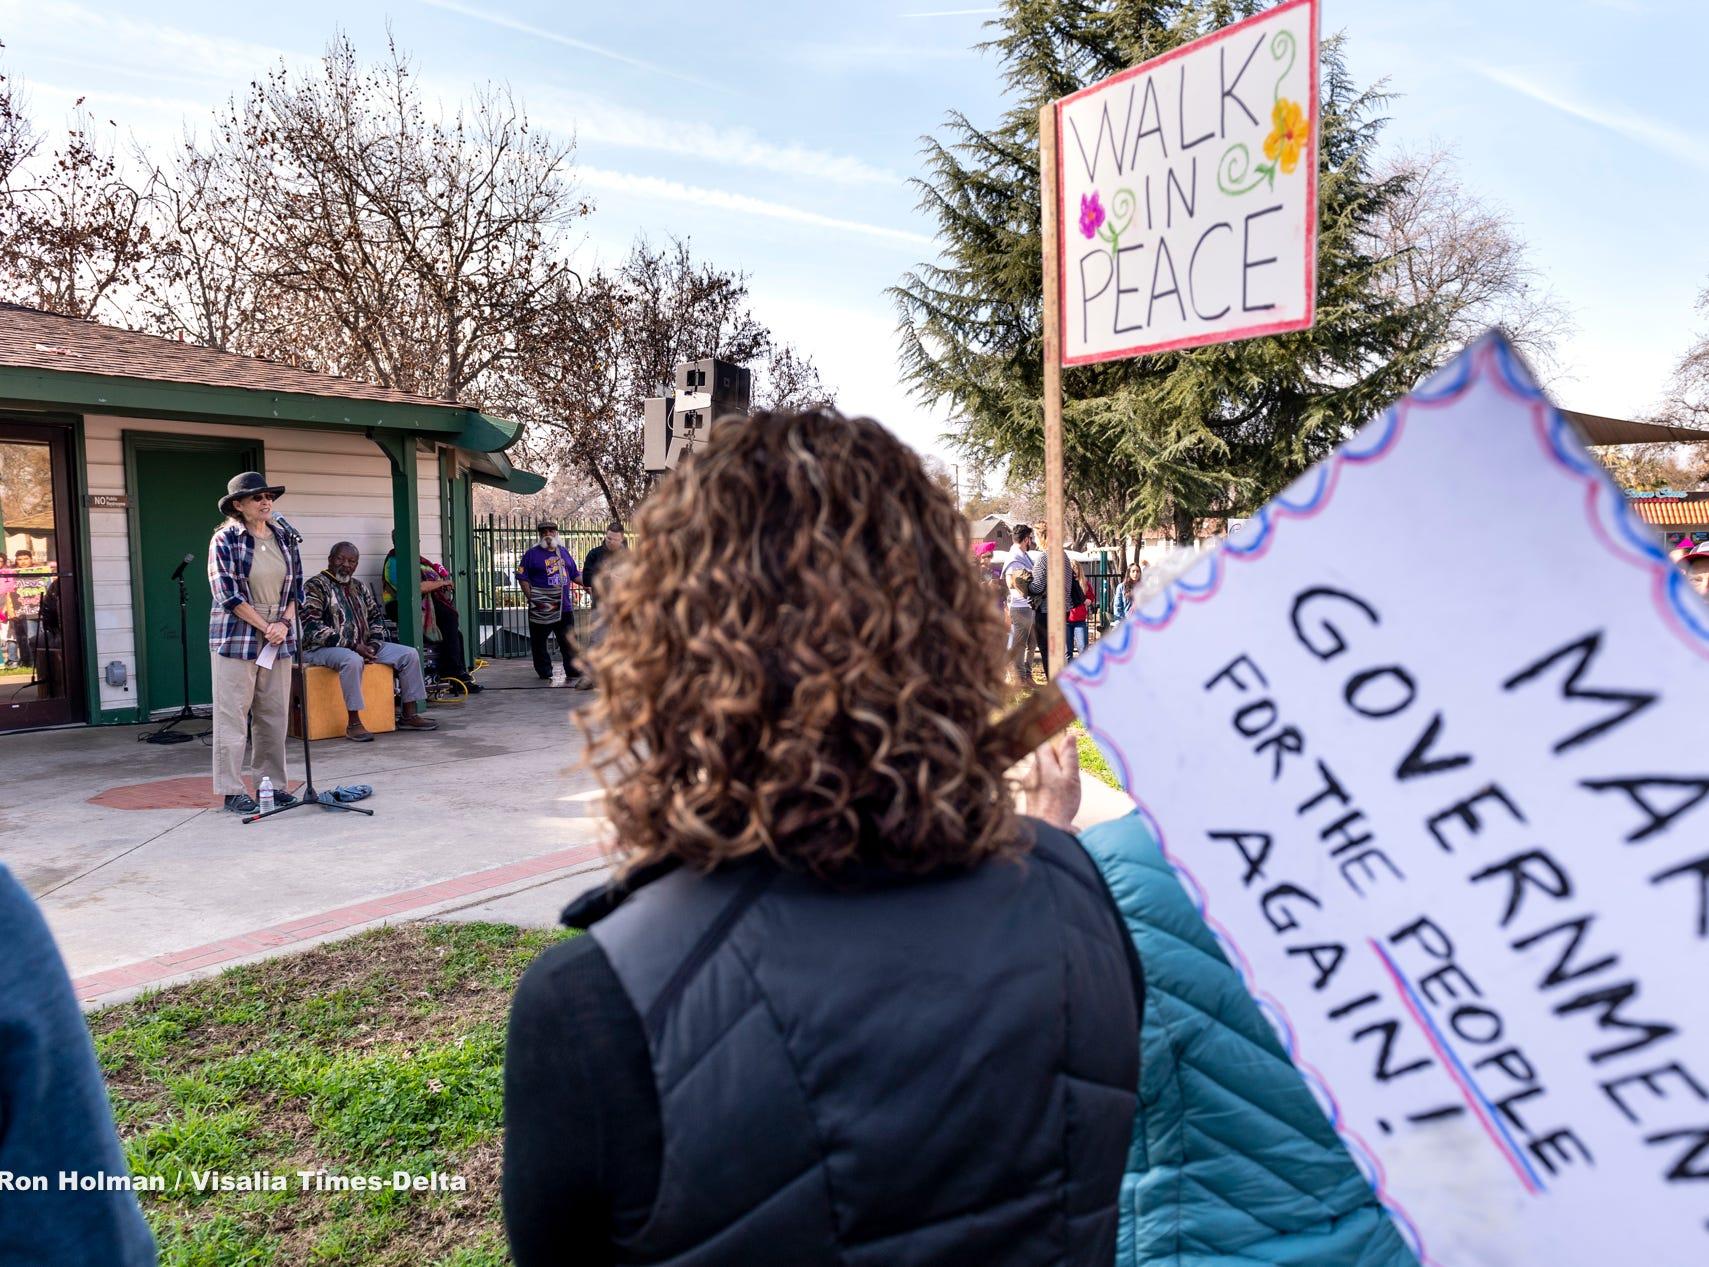 Keren Friedman, left, speaks during the Women's March in Visalia on Saturday, January 19, 2019.